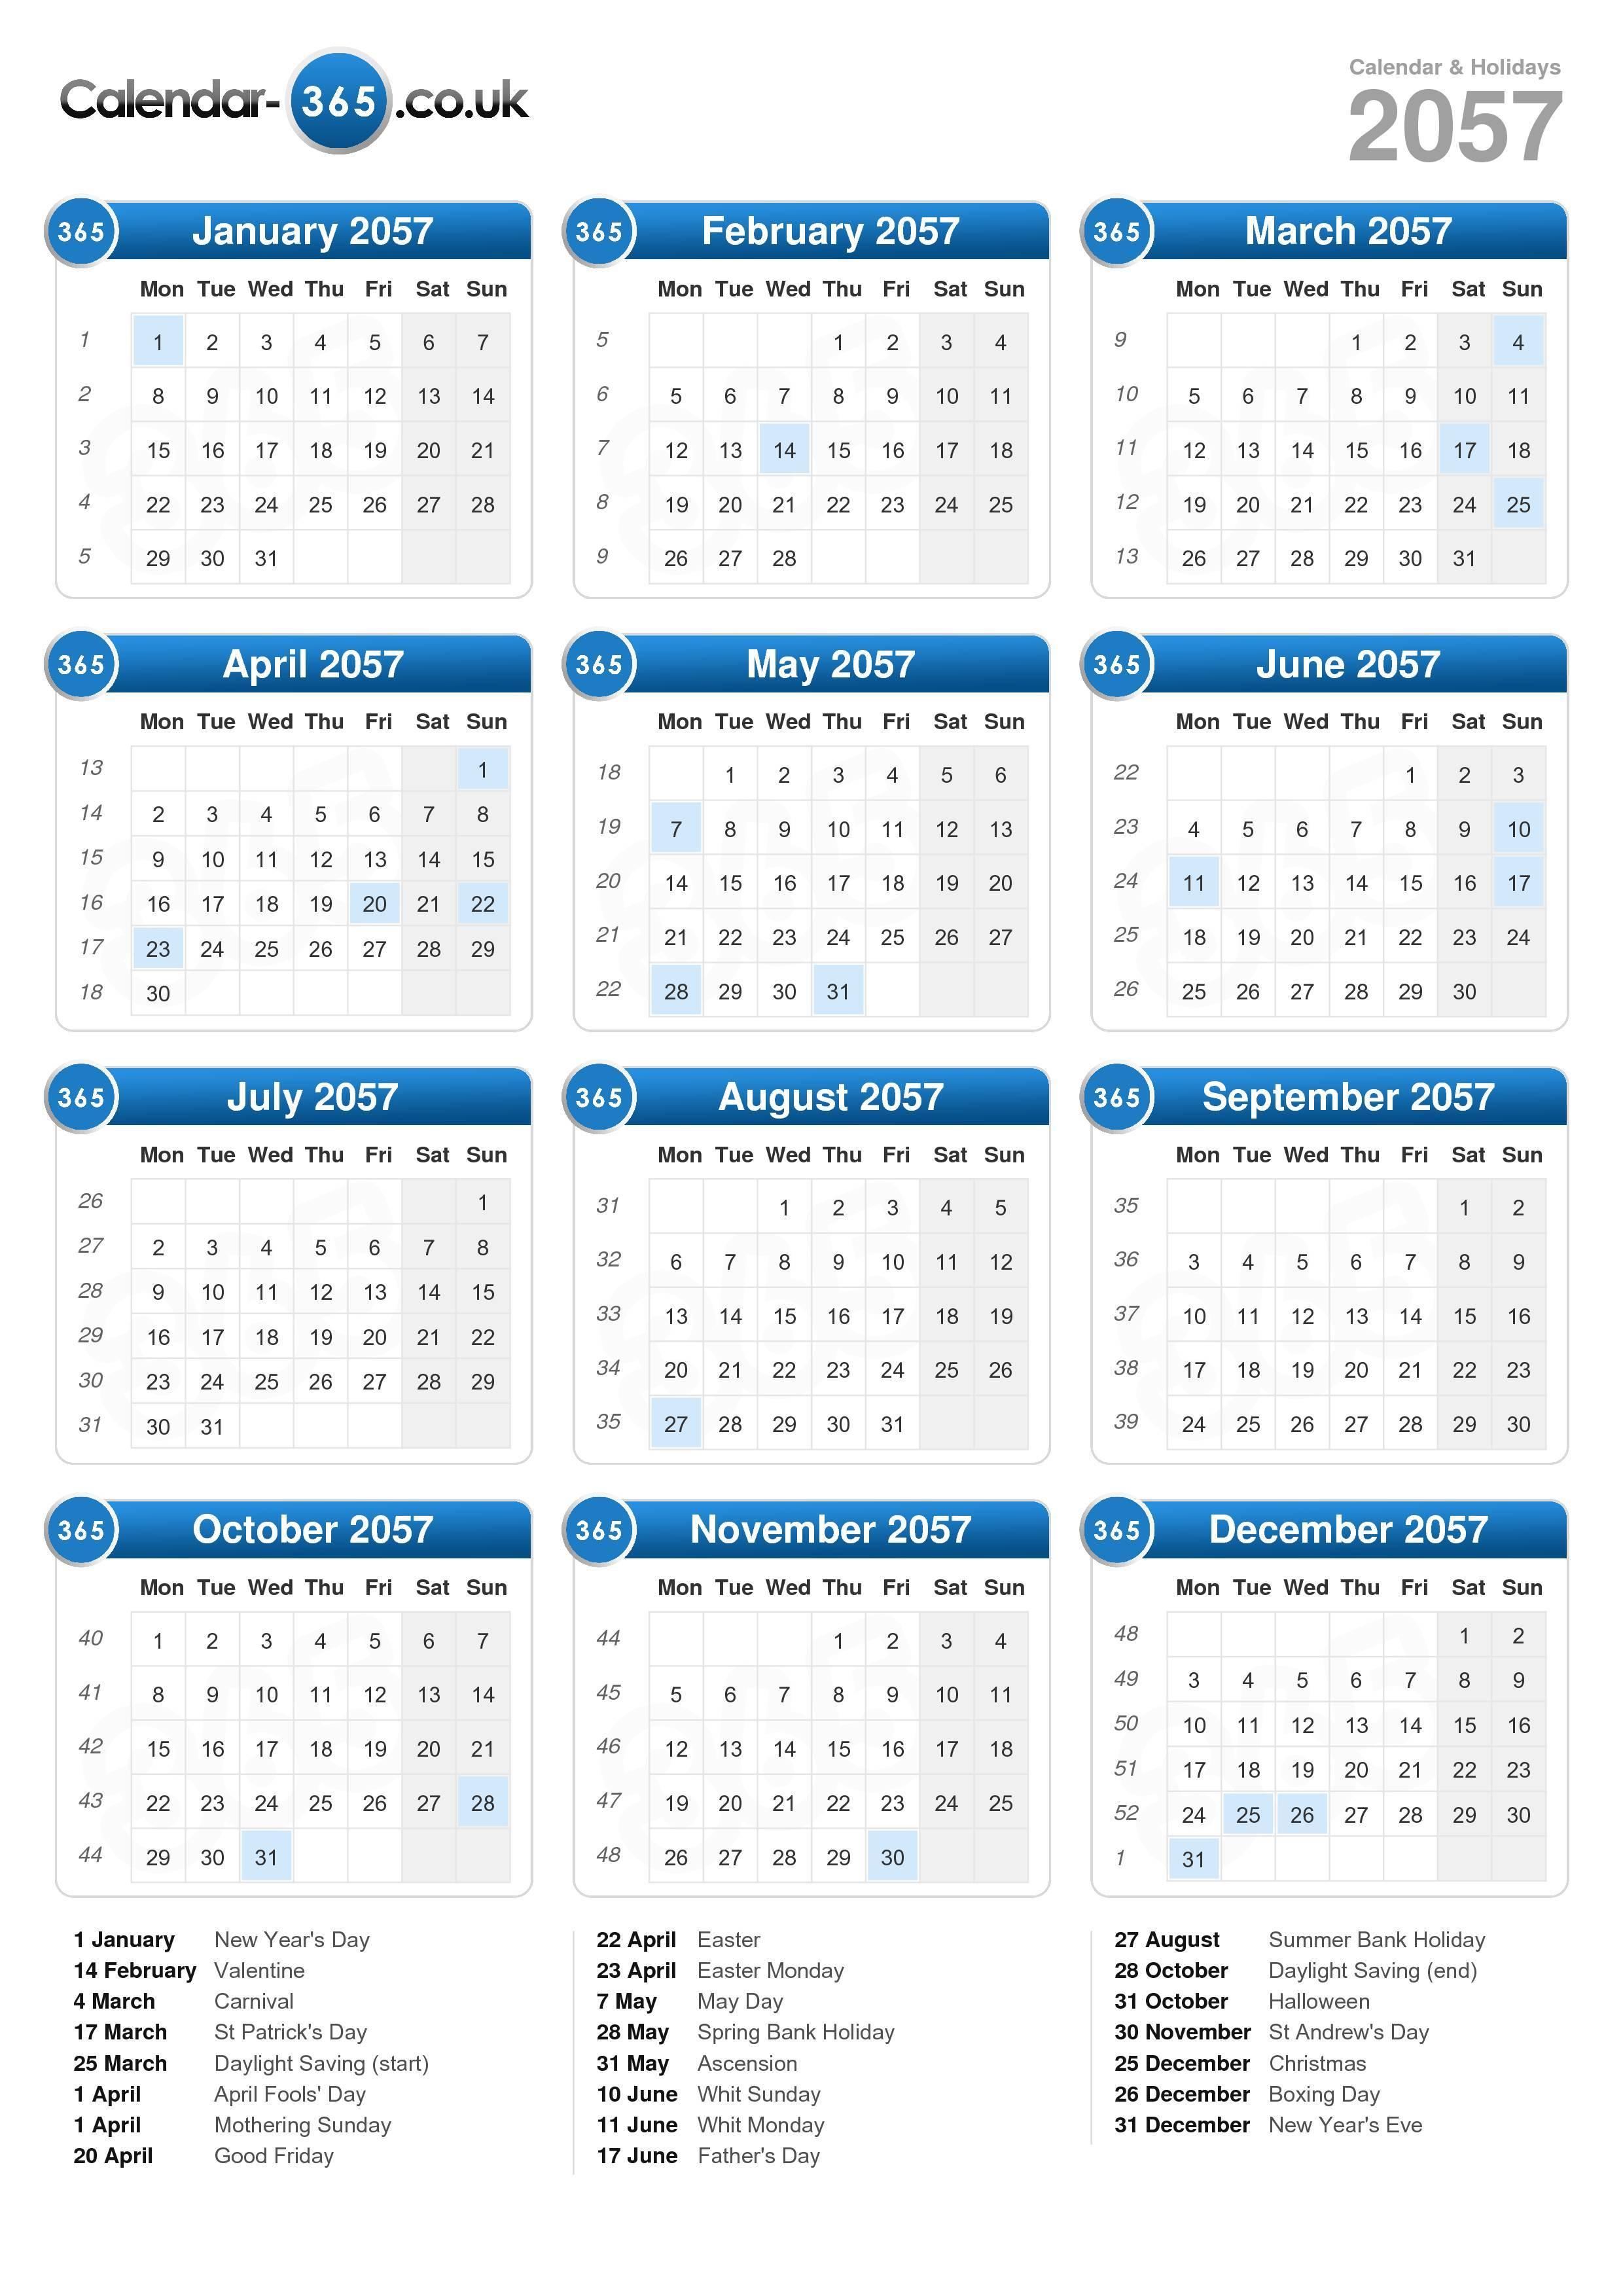 Calendar 2057